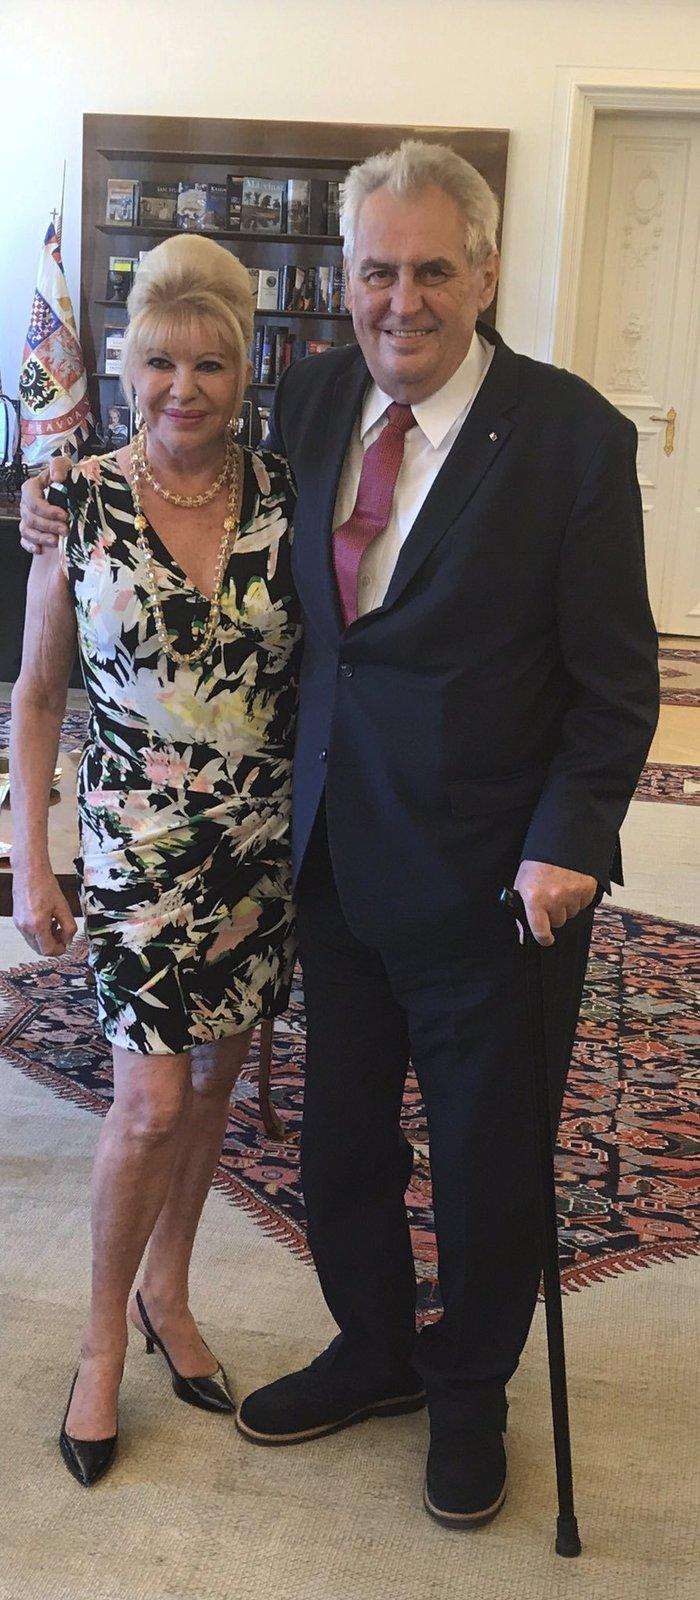 Prezident Miloš Zeman se sešel s Ivanou Trump.